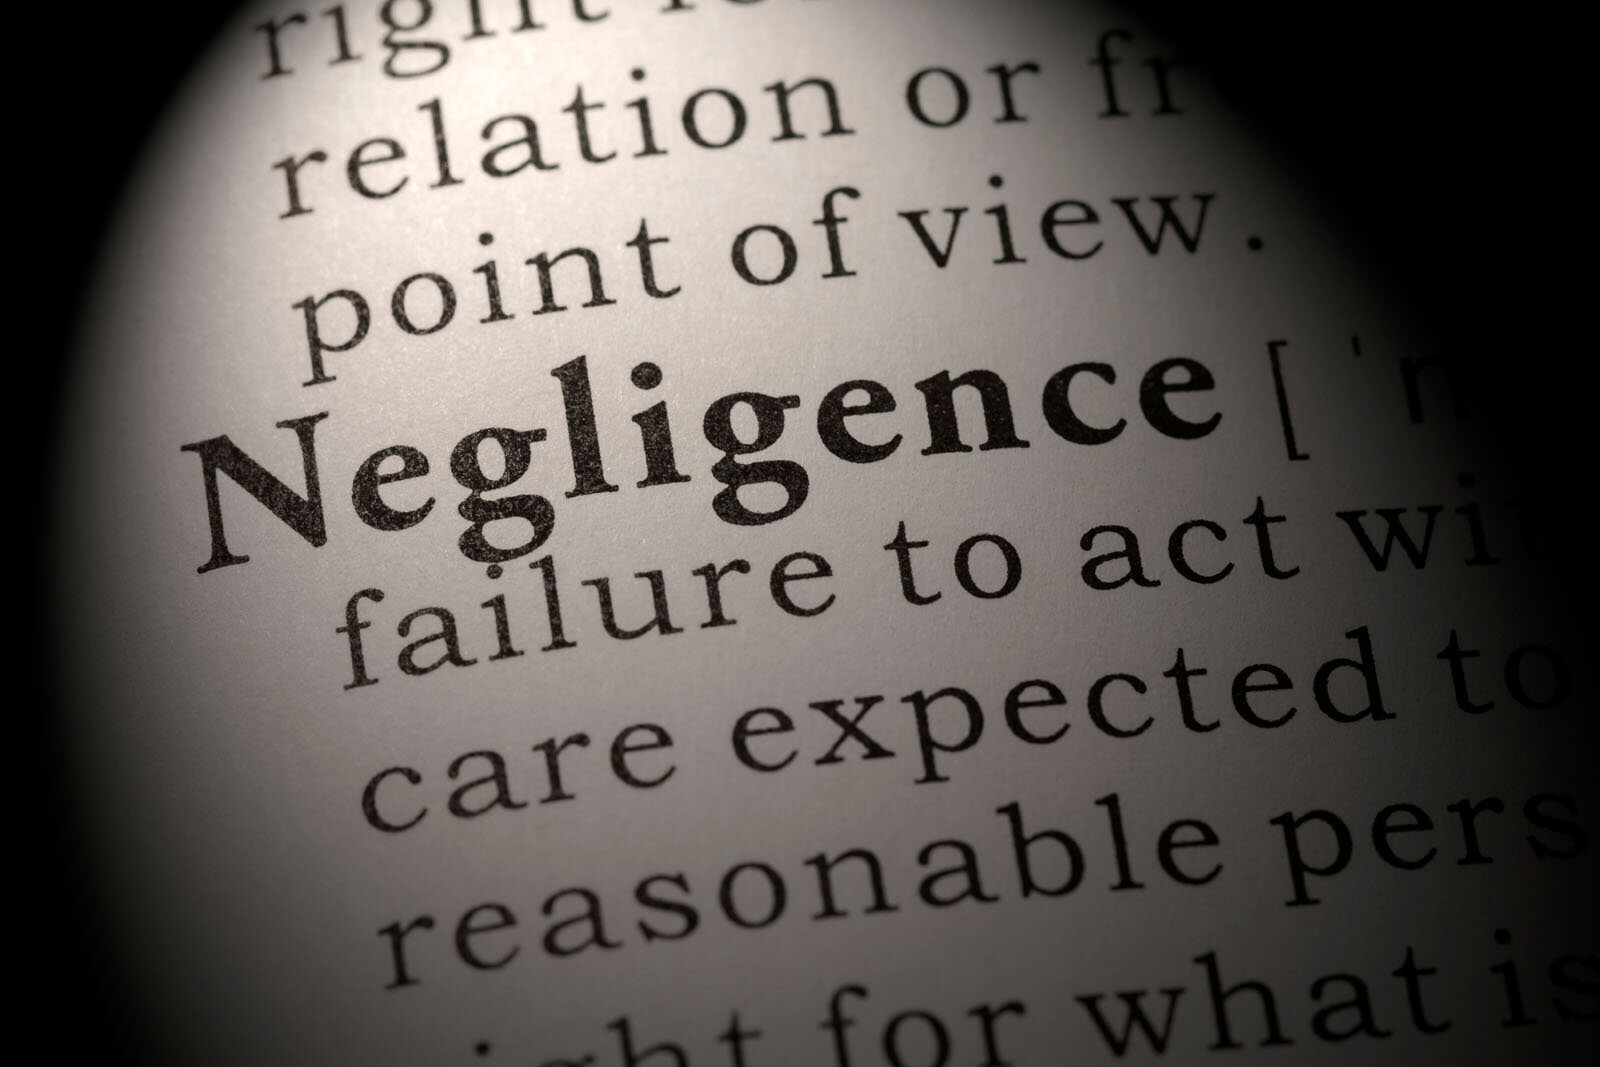 Providing Negligence